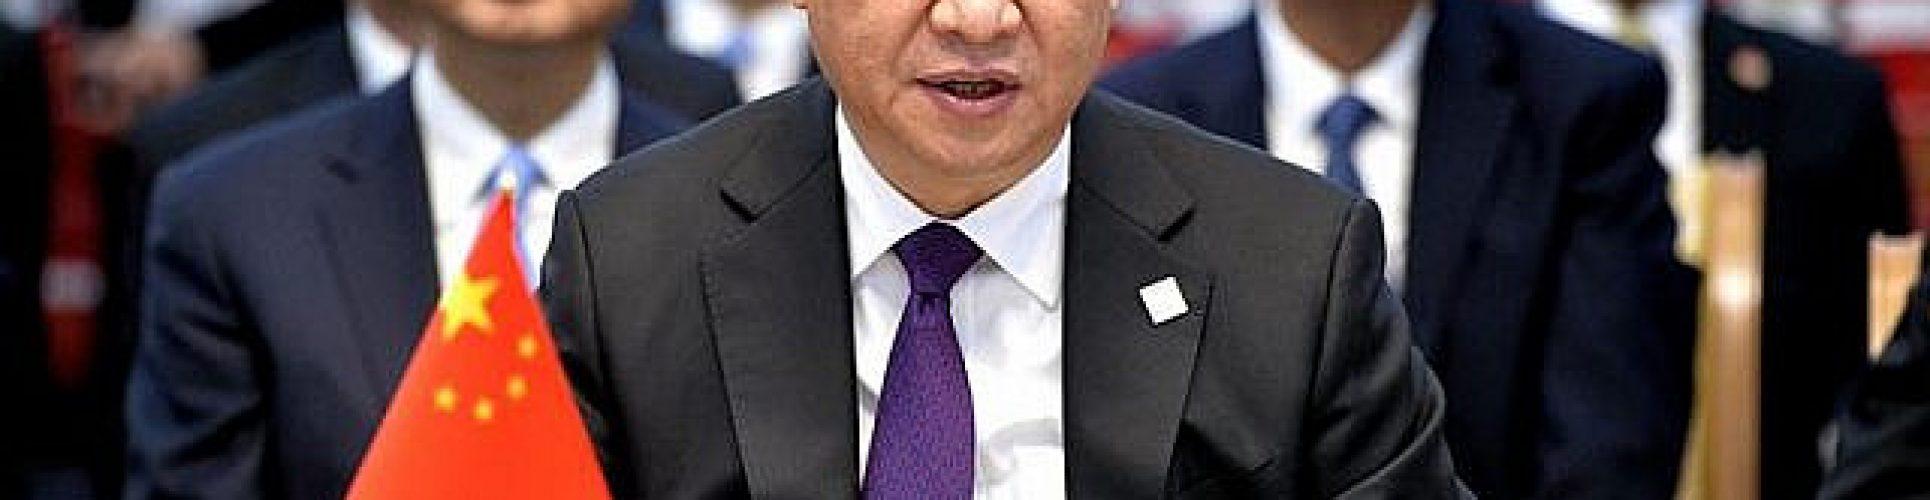 Xi_Jinping_summit-640x400